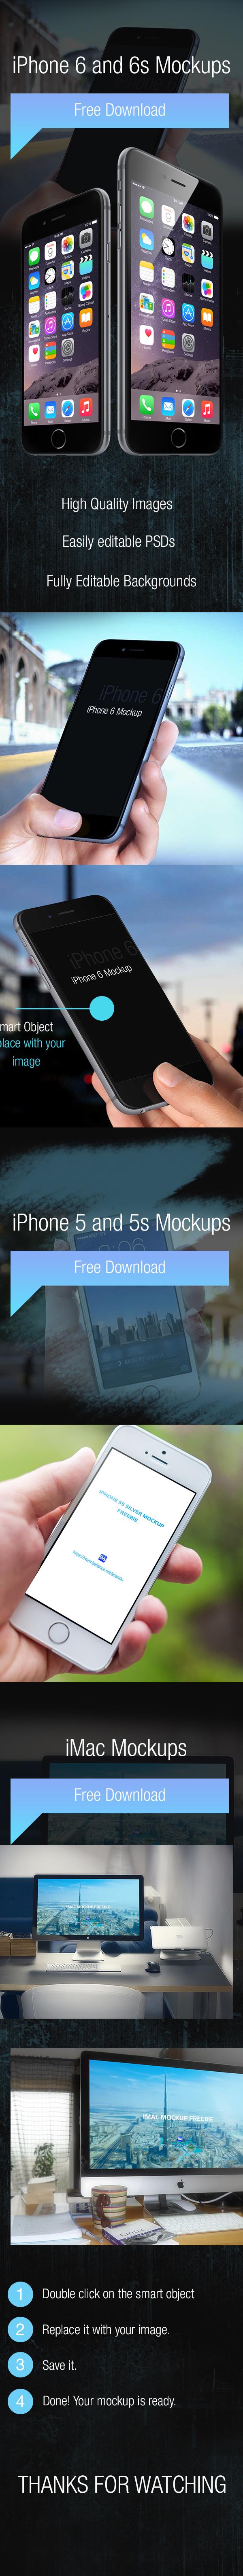 iPhone 6s iPhone6 iphone6 mockup iphone mockup Mockup download imac mockup